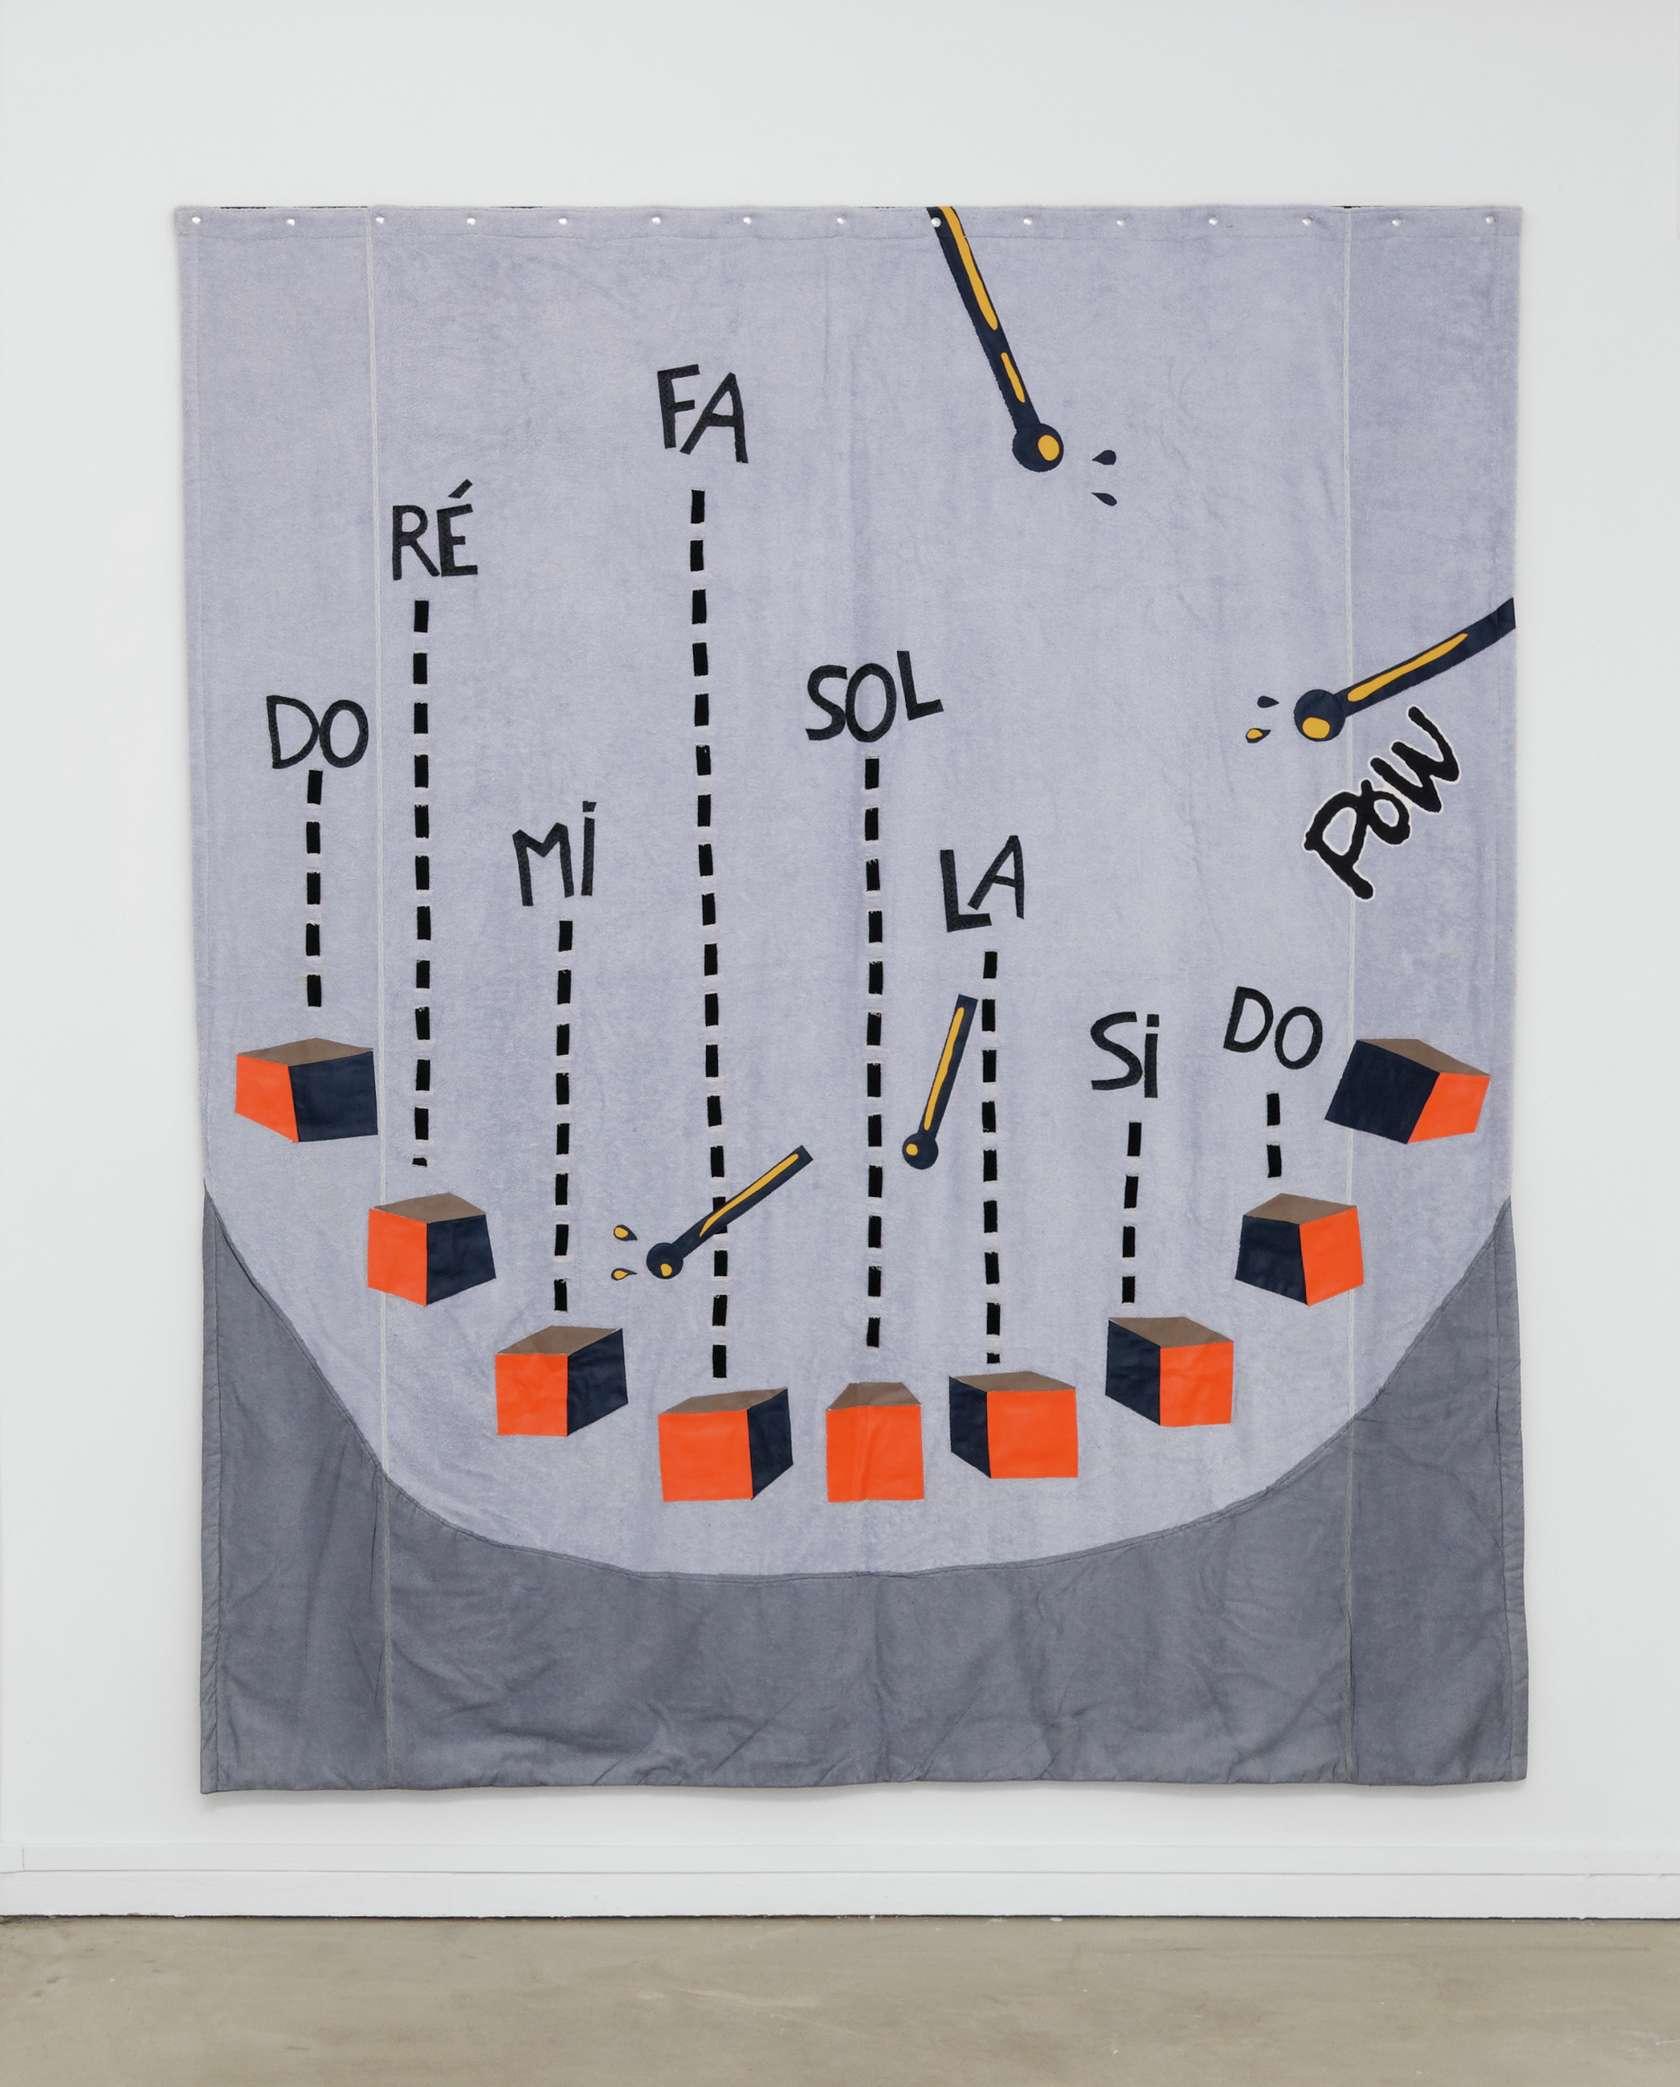 Hippolyte Hentgen, B-R-E-E-K, 2018 Assemblage de tissus cousus250 × 214 cm / 98 3/8 × 84 1/4 in.